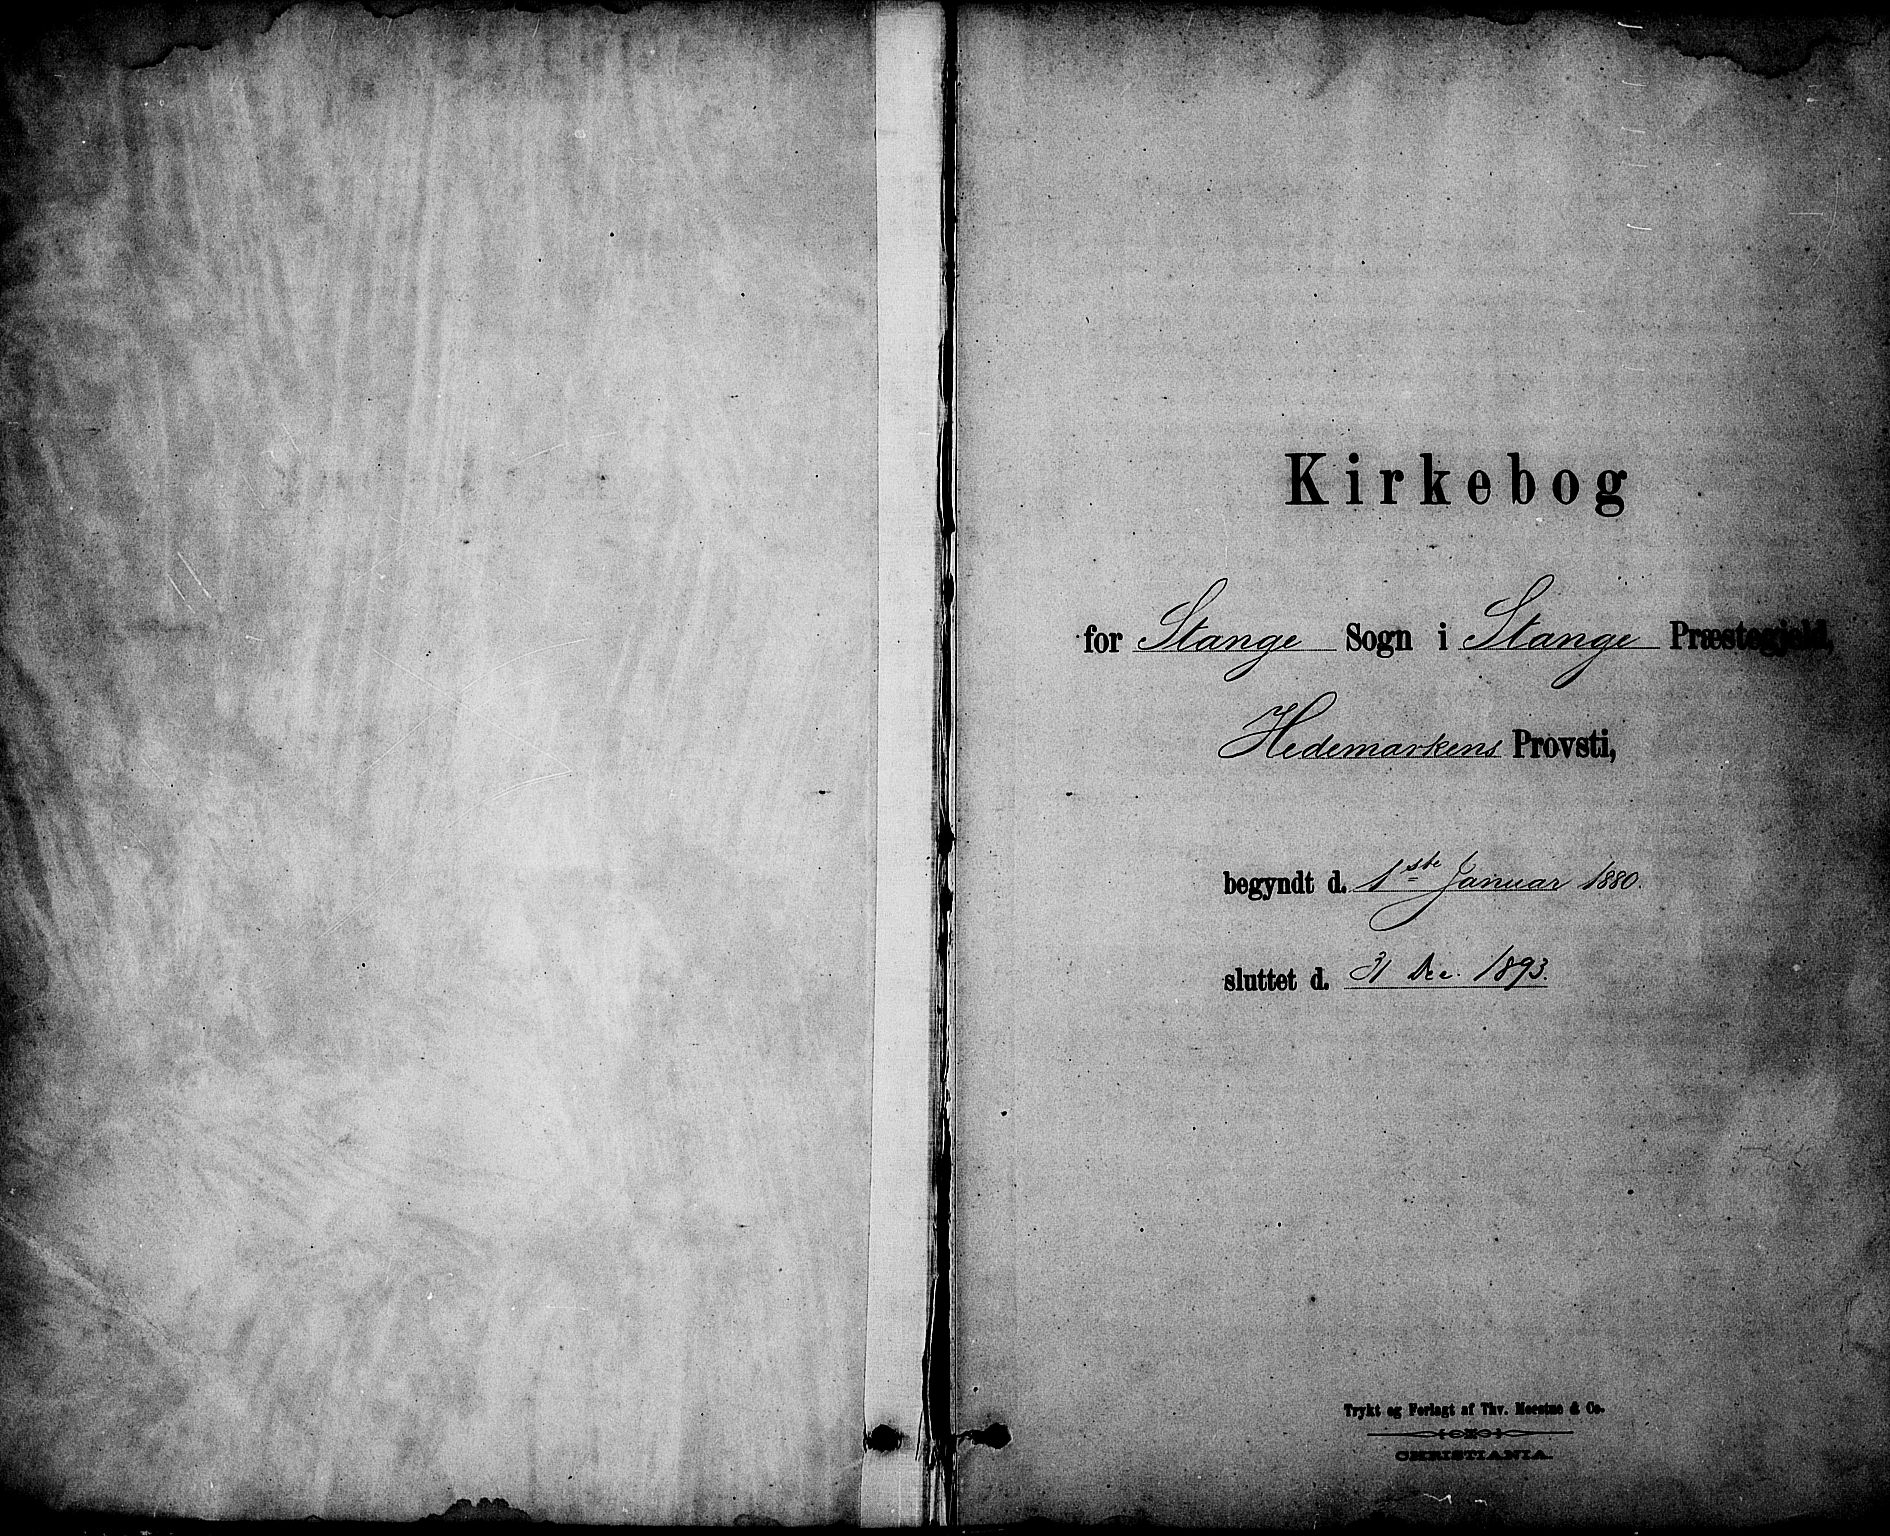 SAH, Stange prestekontor, K/L0017: Ministerialbok nr. 17, 1880-1893